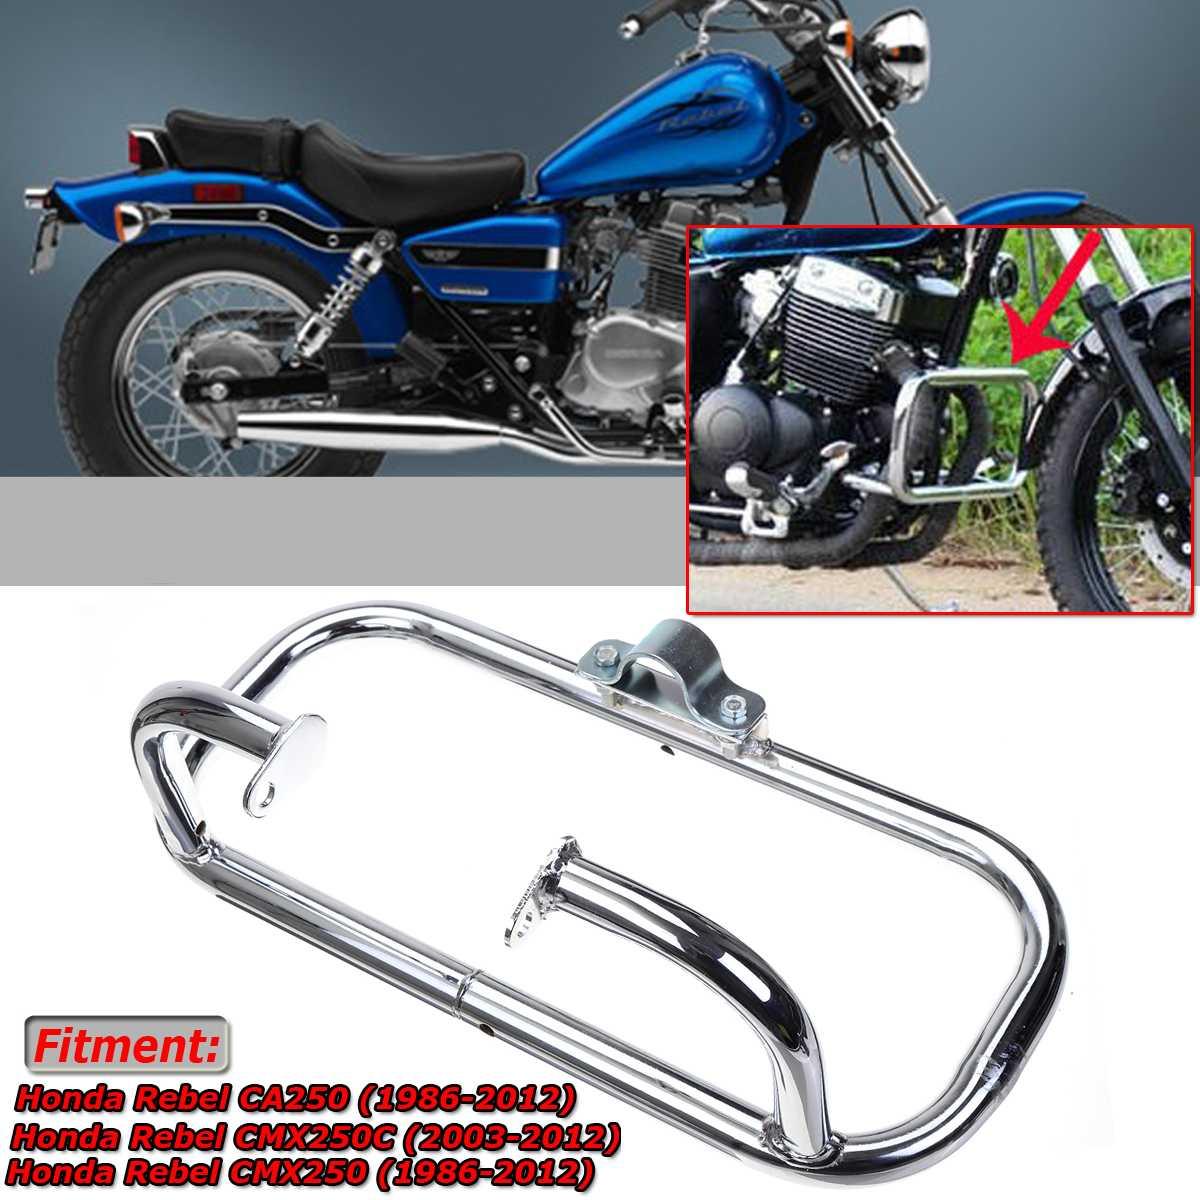 New Engine Guard Crash Bar Motorcycle Front Engine Guard Crash Bar For Honda Rebel 250 CA250 CMX250 CMX250C Metal Safety Bumper